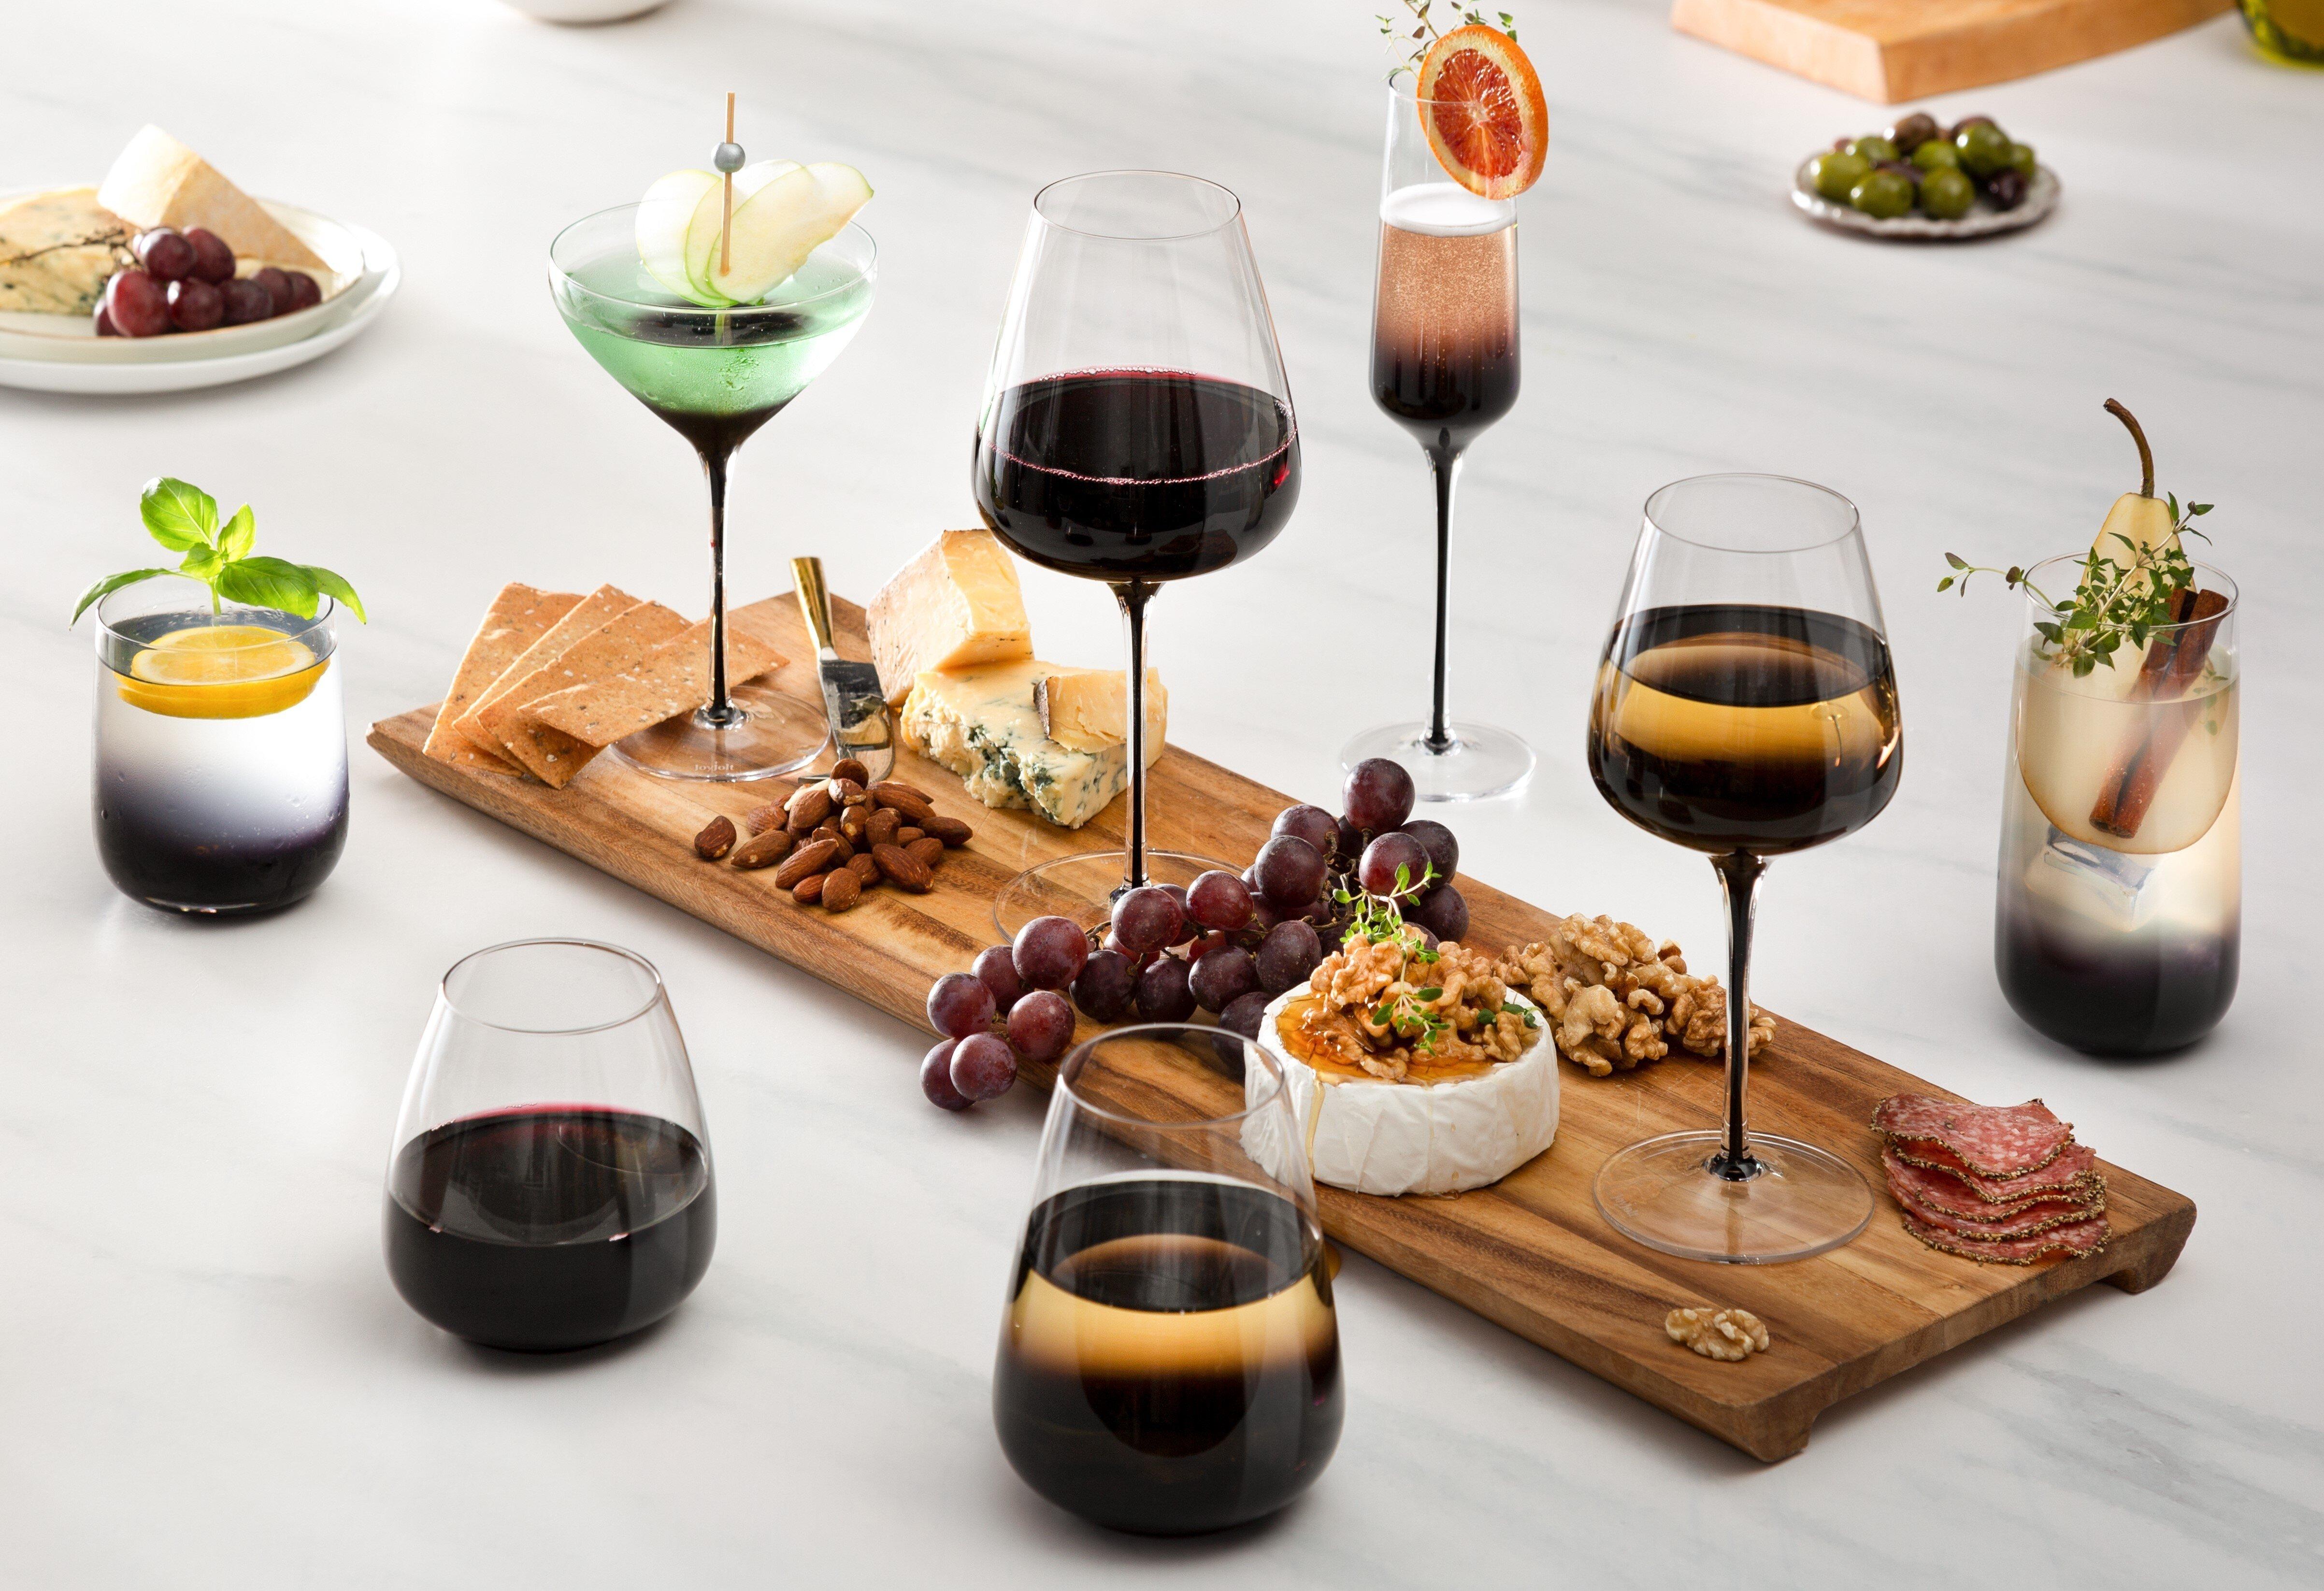 Large Red Wine Glasses Drinkware You Ll Love In 2021 Wayfair